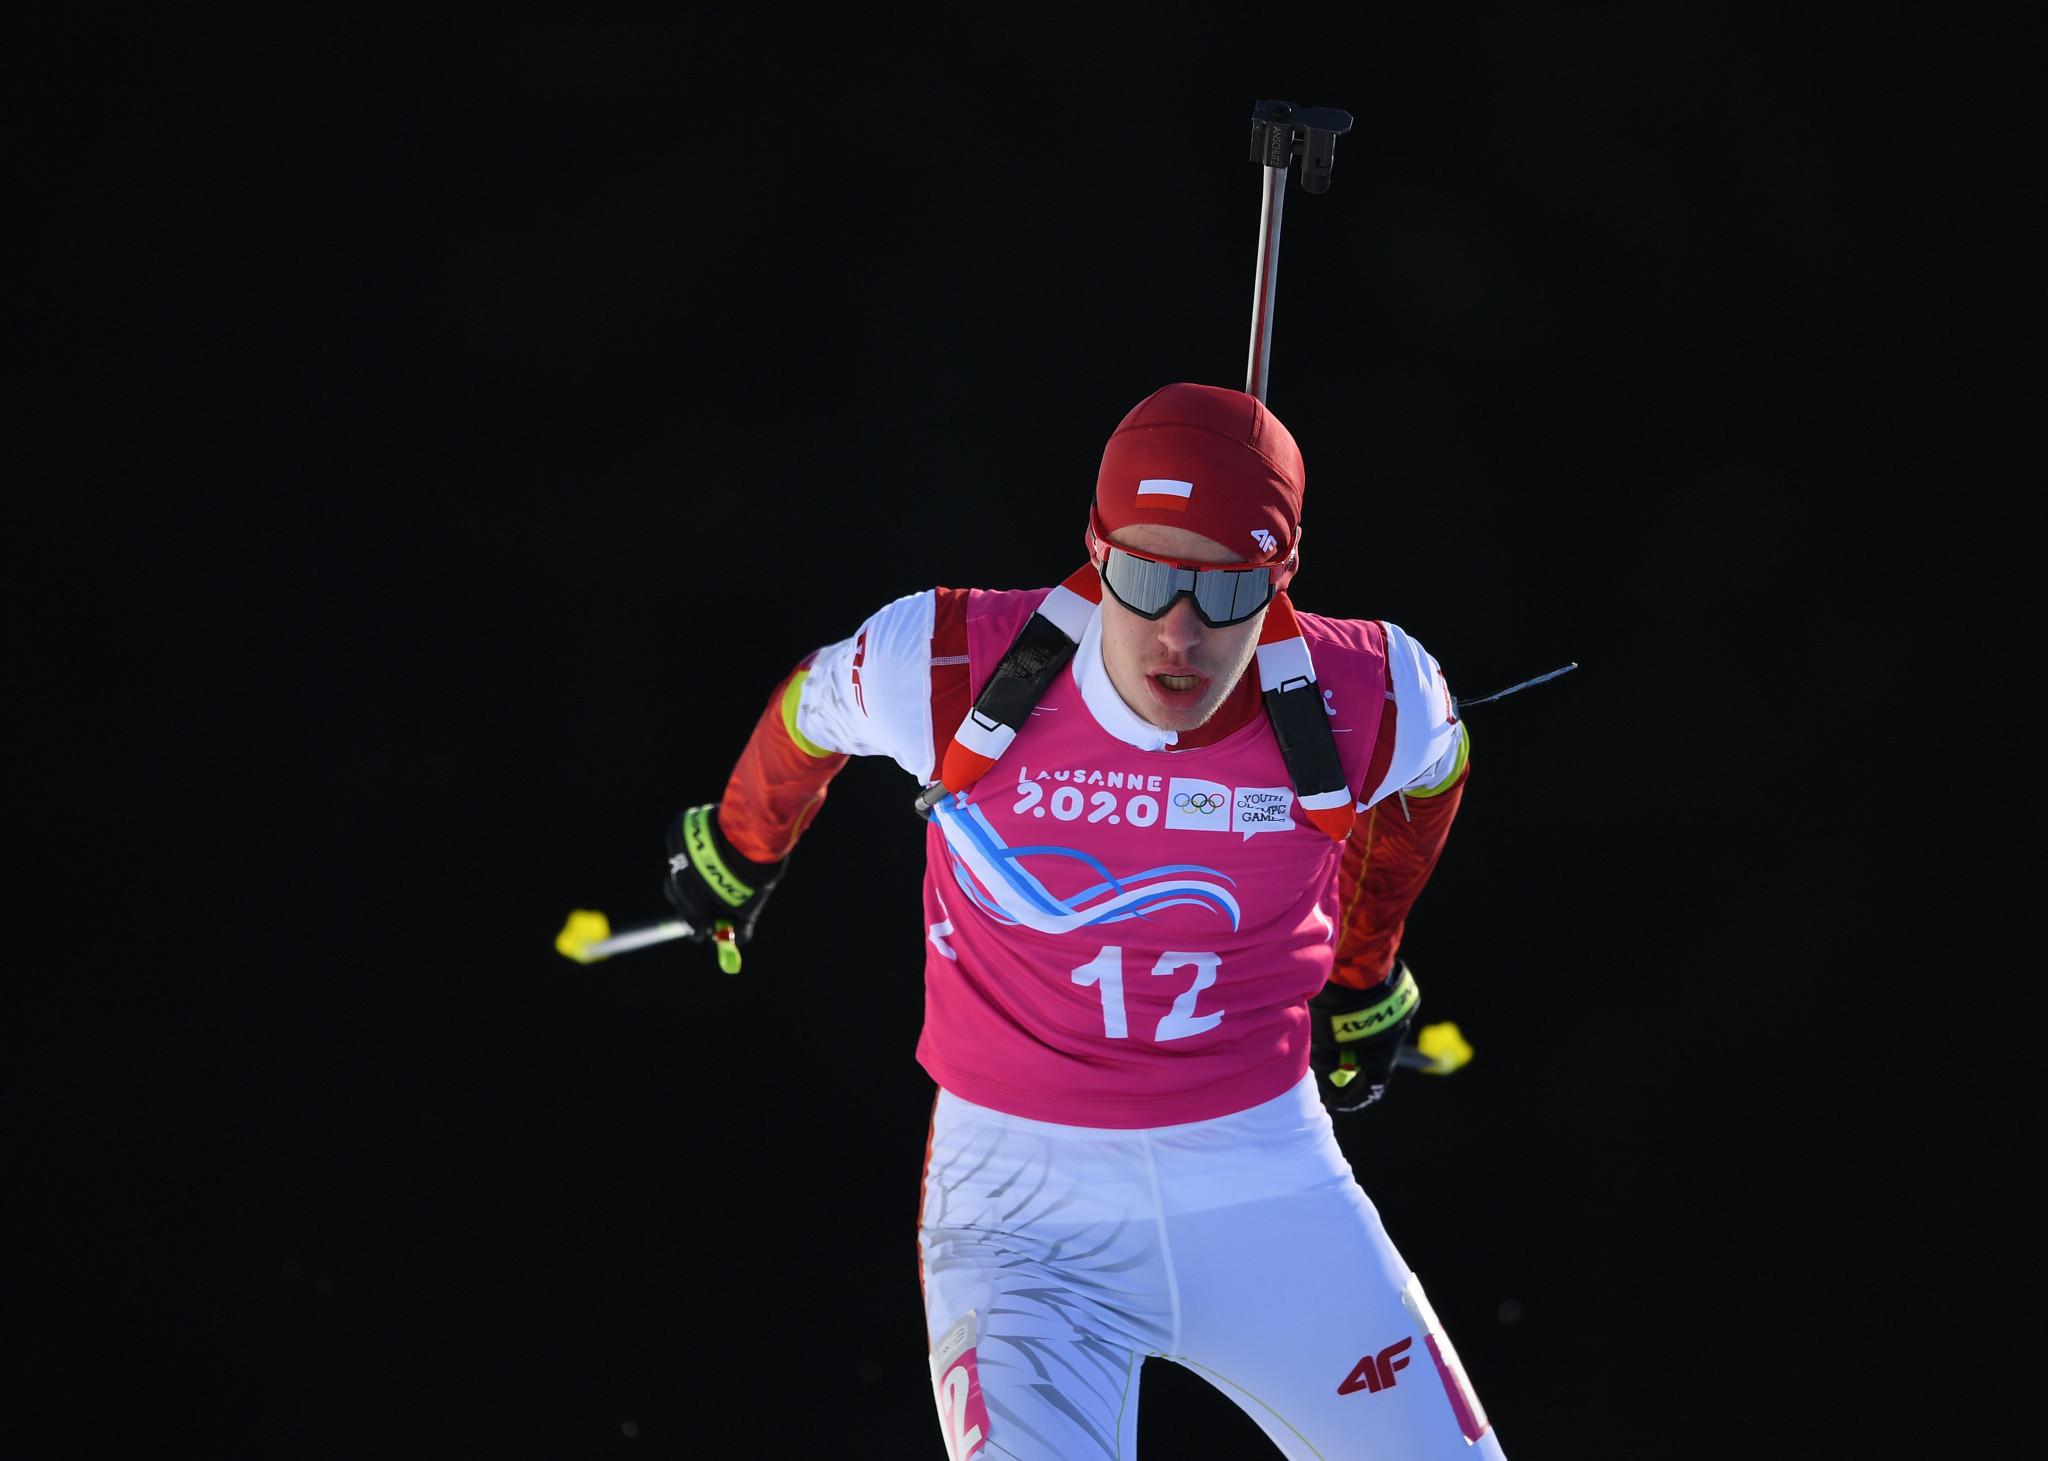 France and Poland win biathlon relays at IBU Youth World Championships